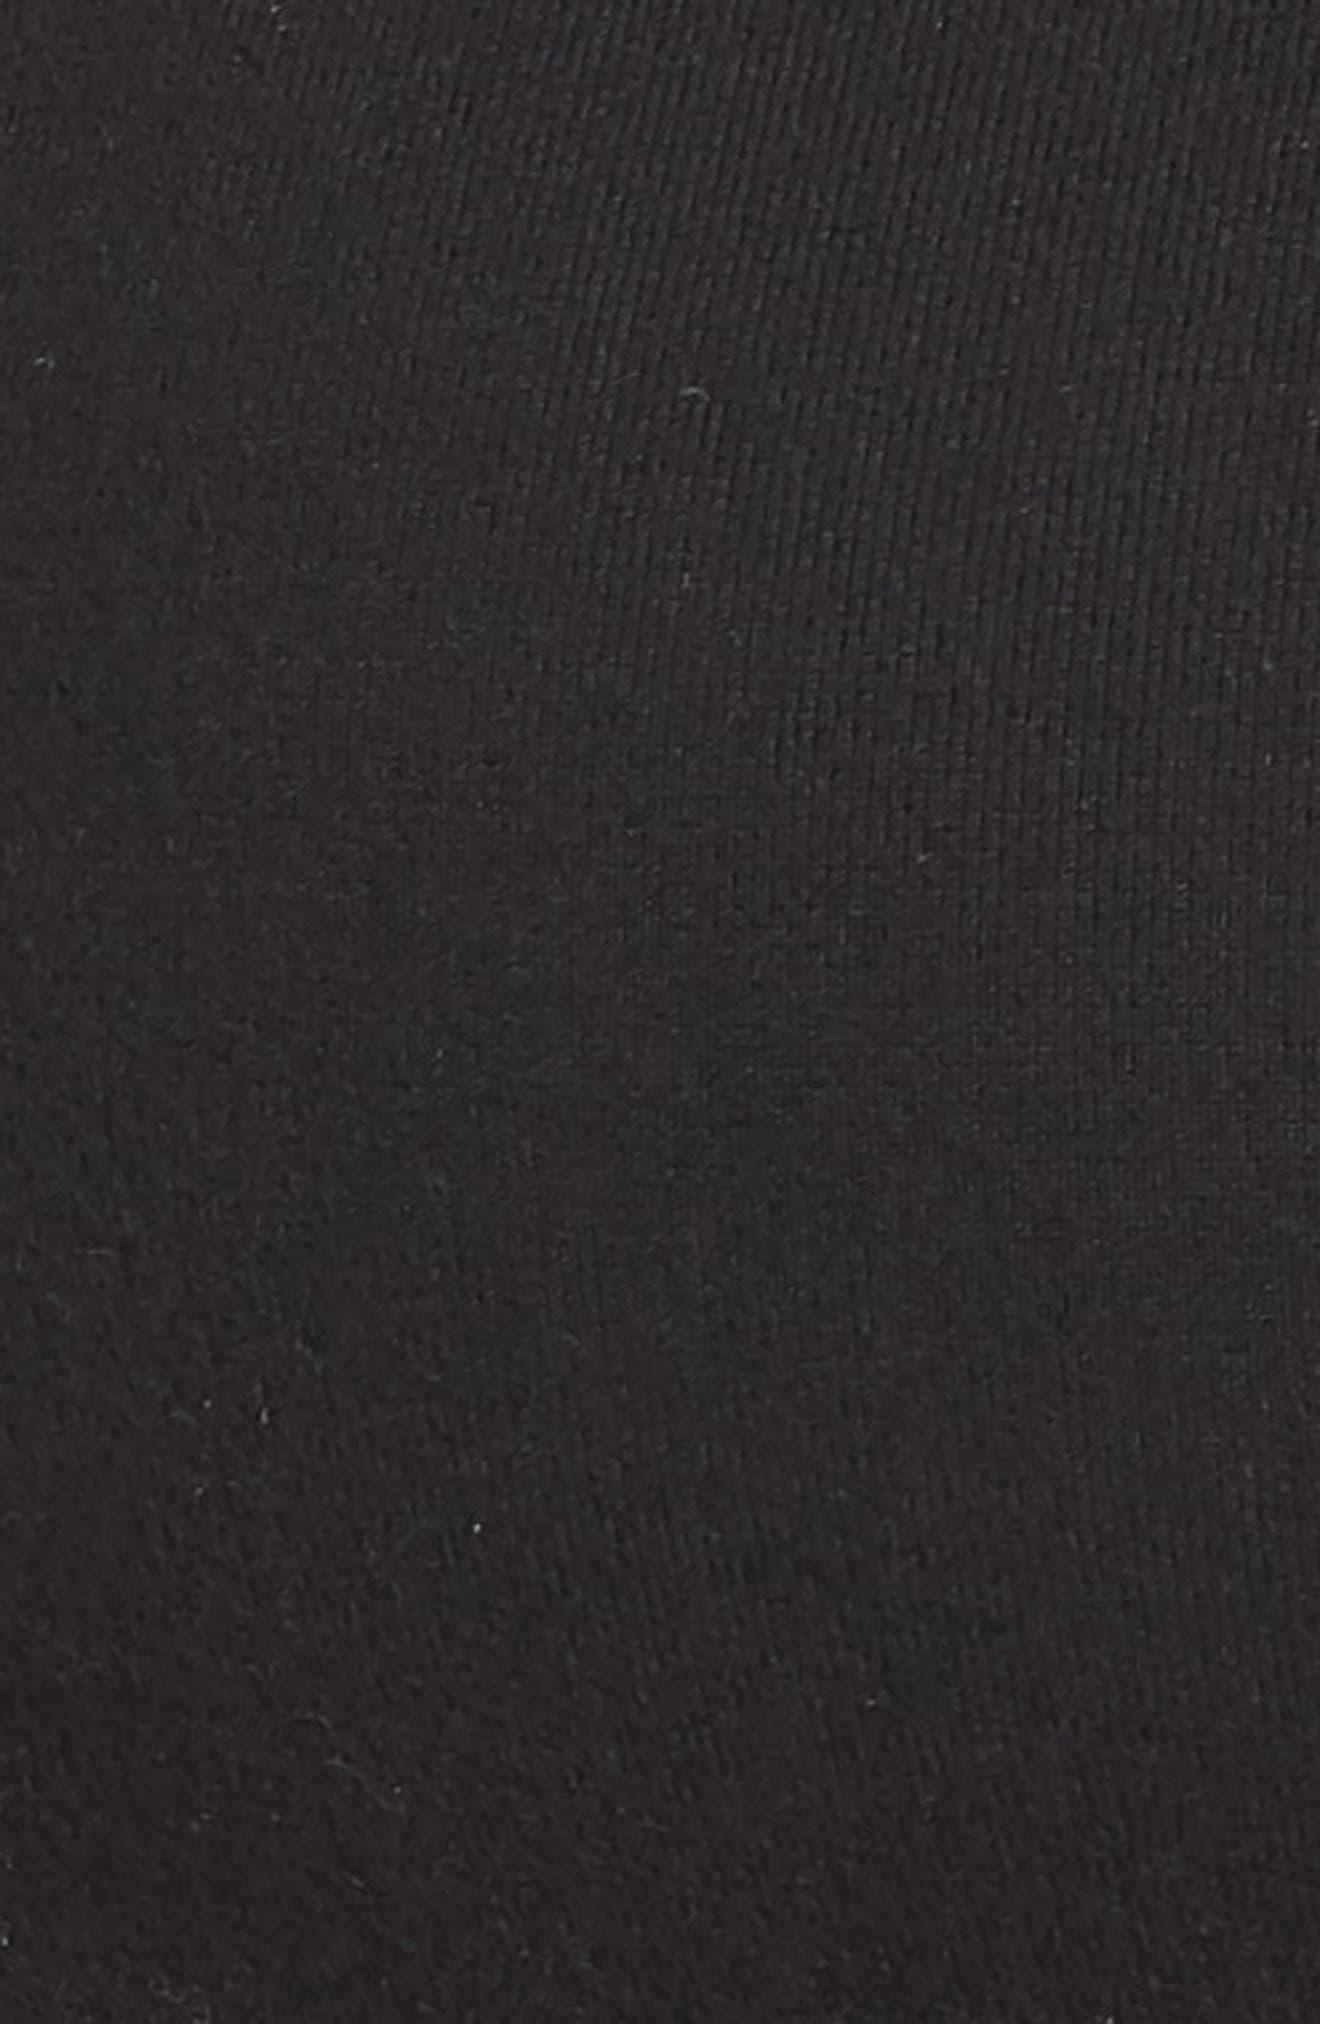 Frill Seeker Sports Bra,                             Alternate thumbnail 9, color,                             Jet Black